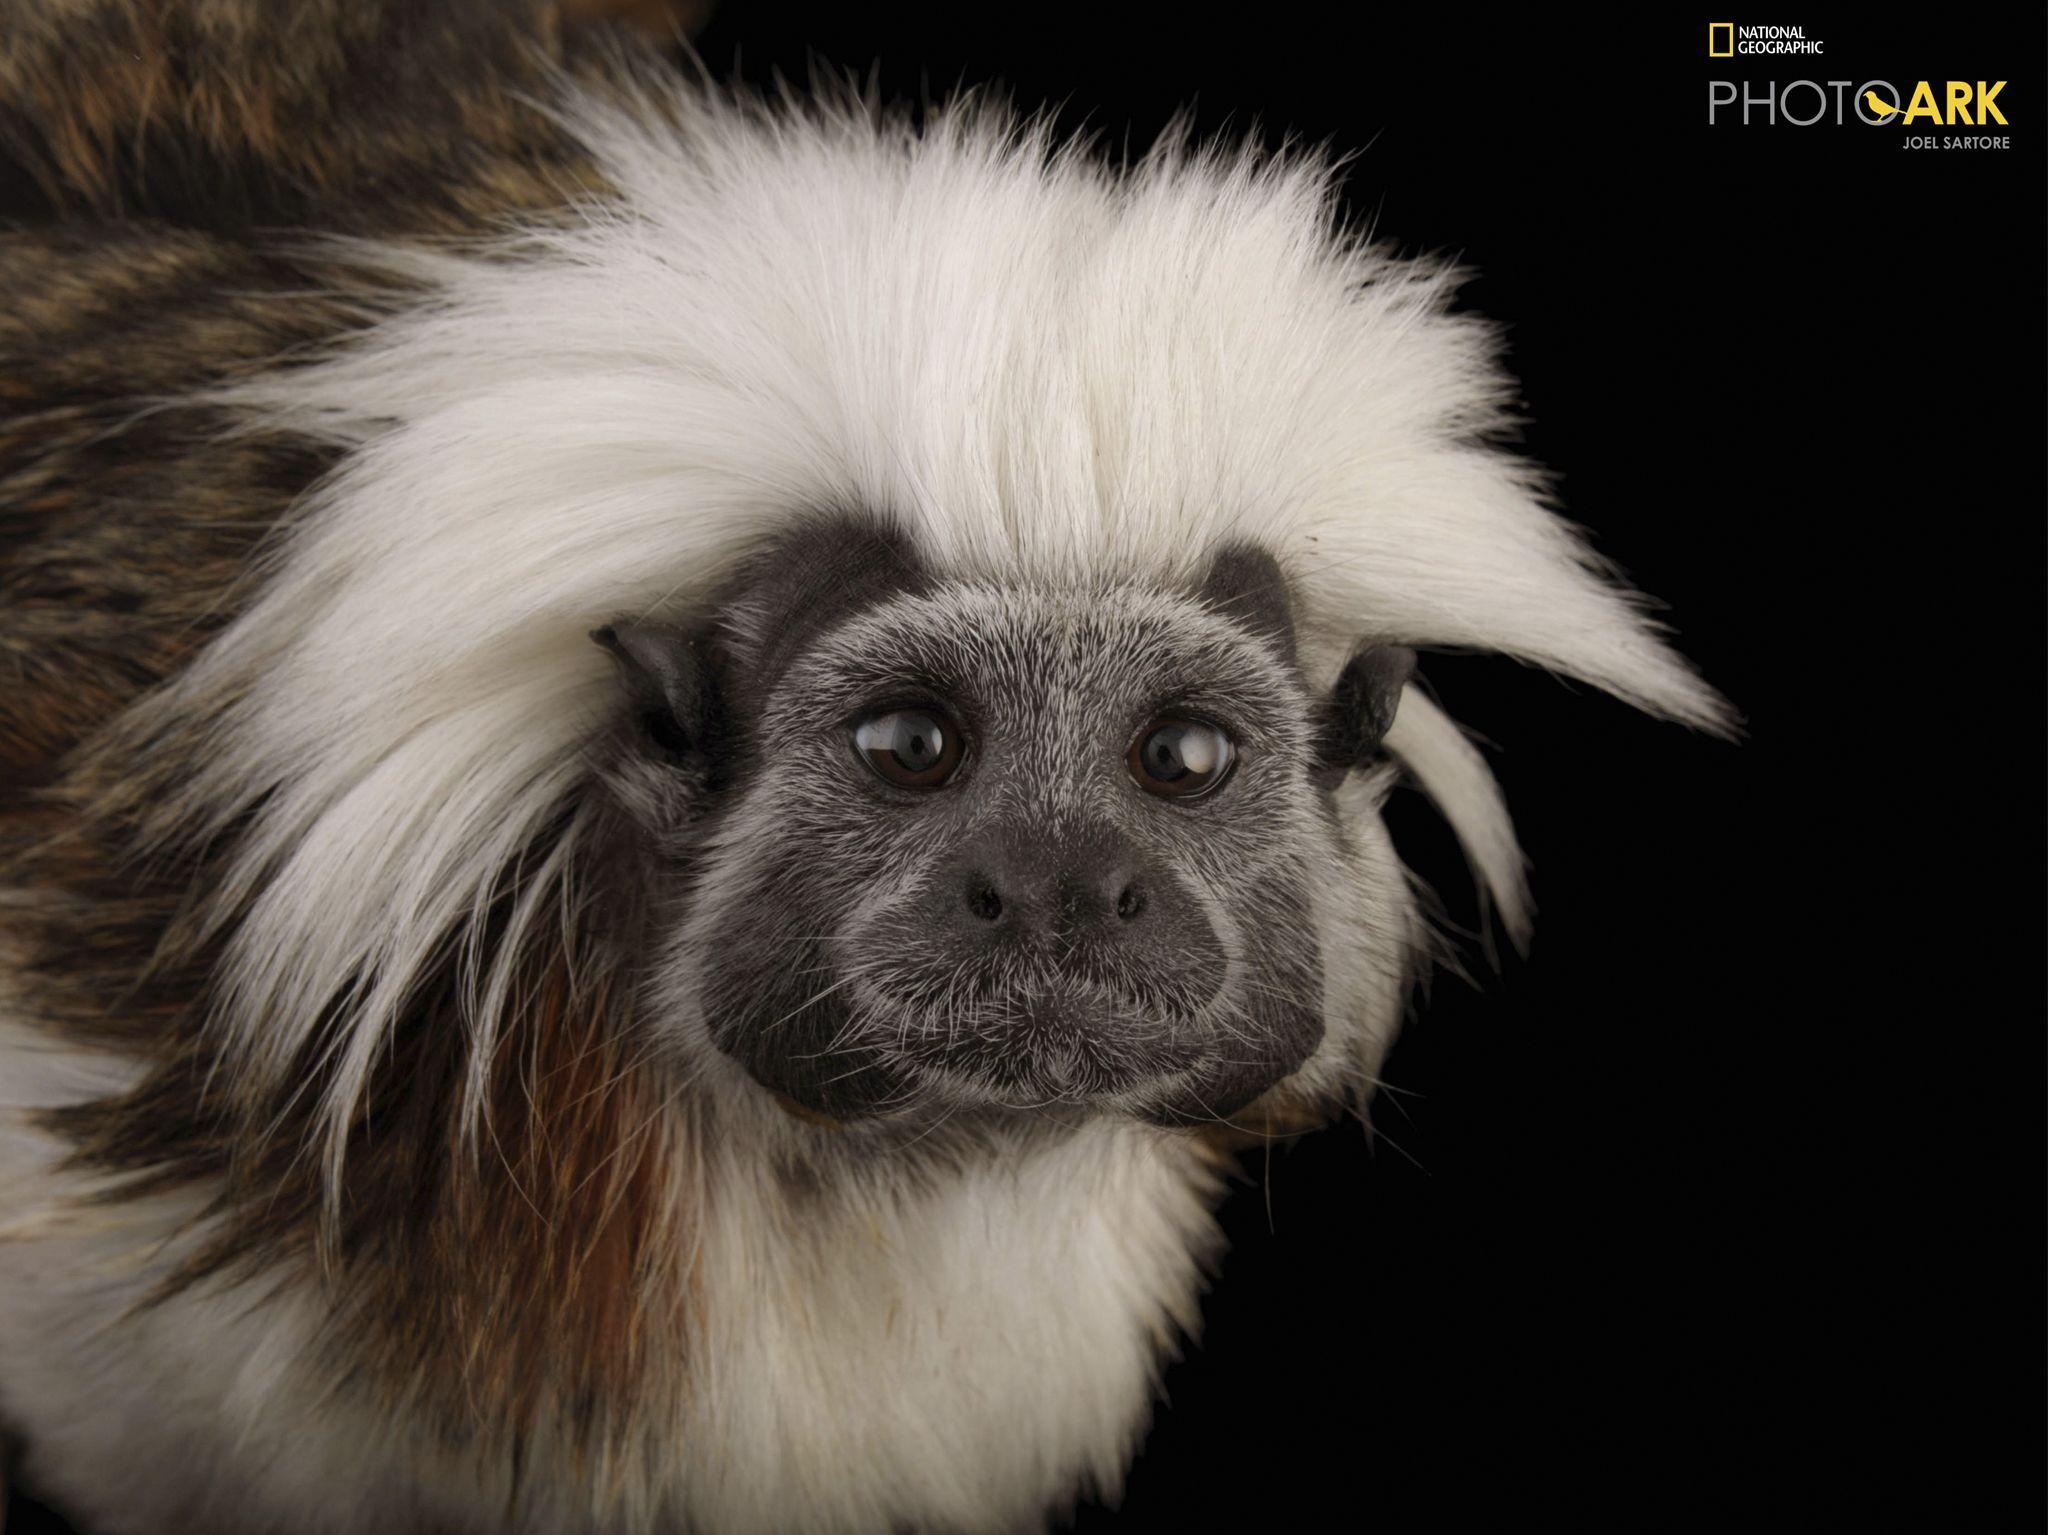 قرد تمارين قطني الرأس المهدد بالانقراض (Saguinus oedipus) في... [Photo of the day - نوفمبر 2020]